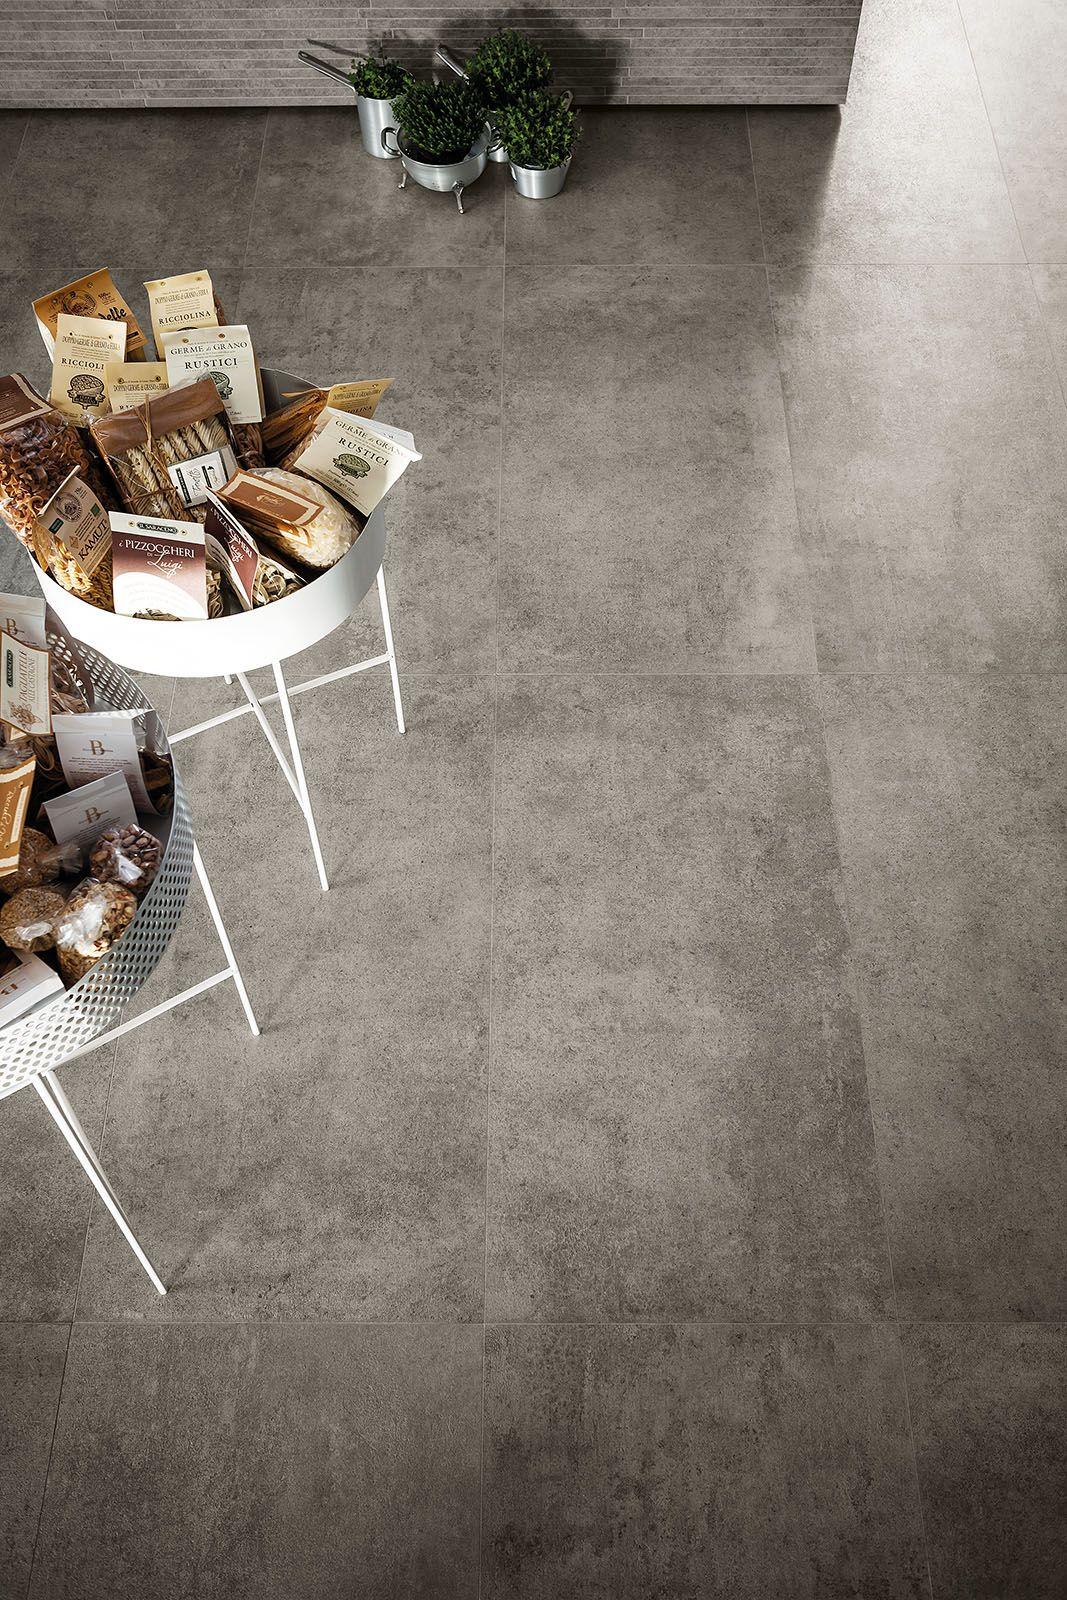 Brooklyn concrete floor tiles marazzi pinterest brooklyn concrete floor tiles marazzi dailygadgetfo Choice Image